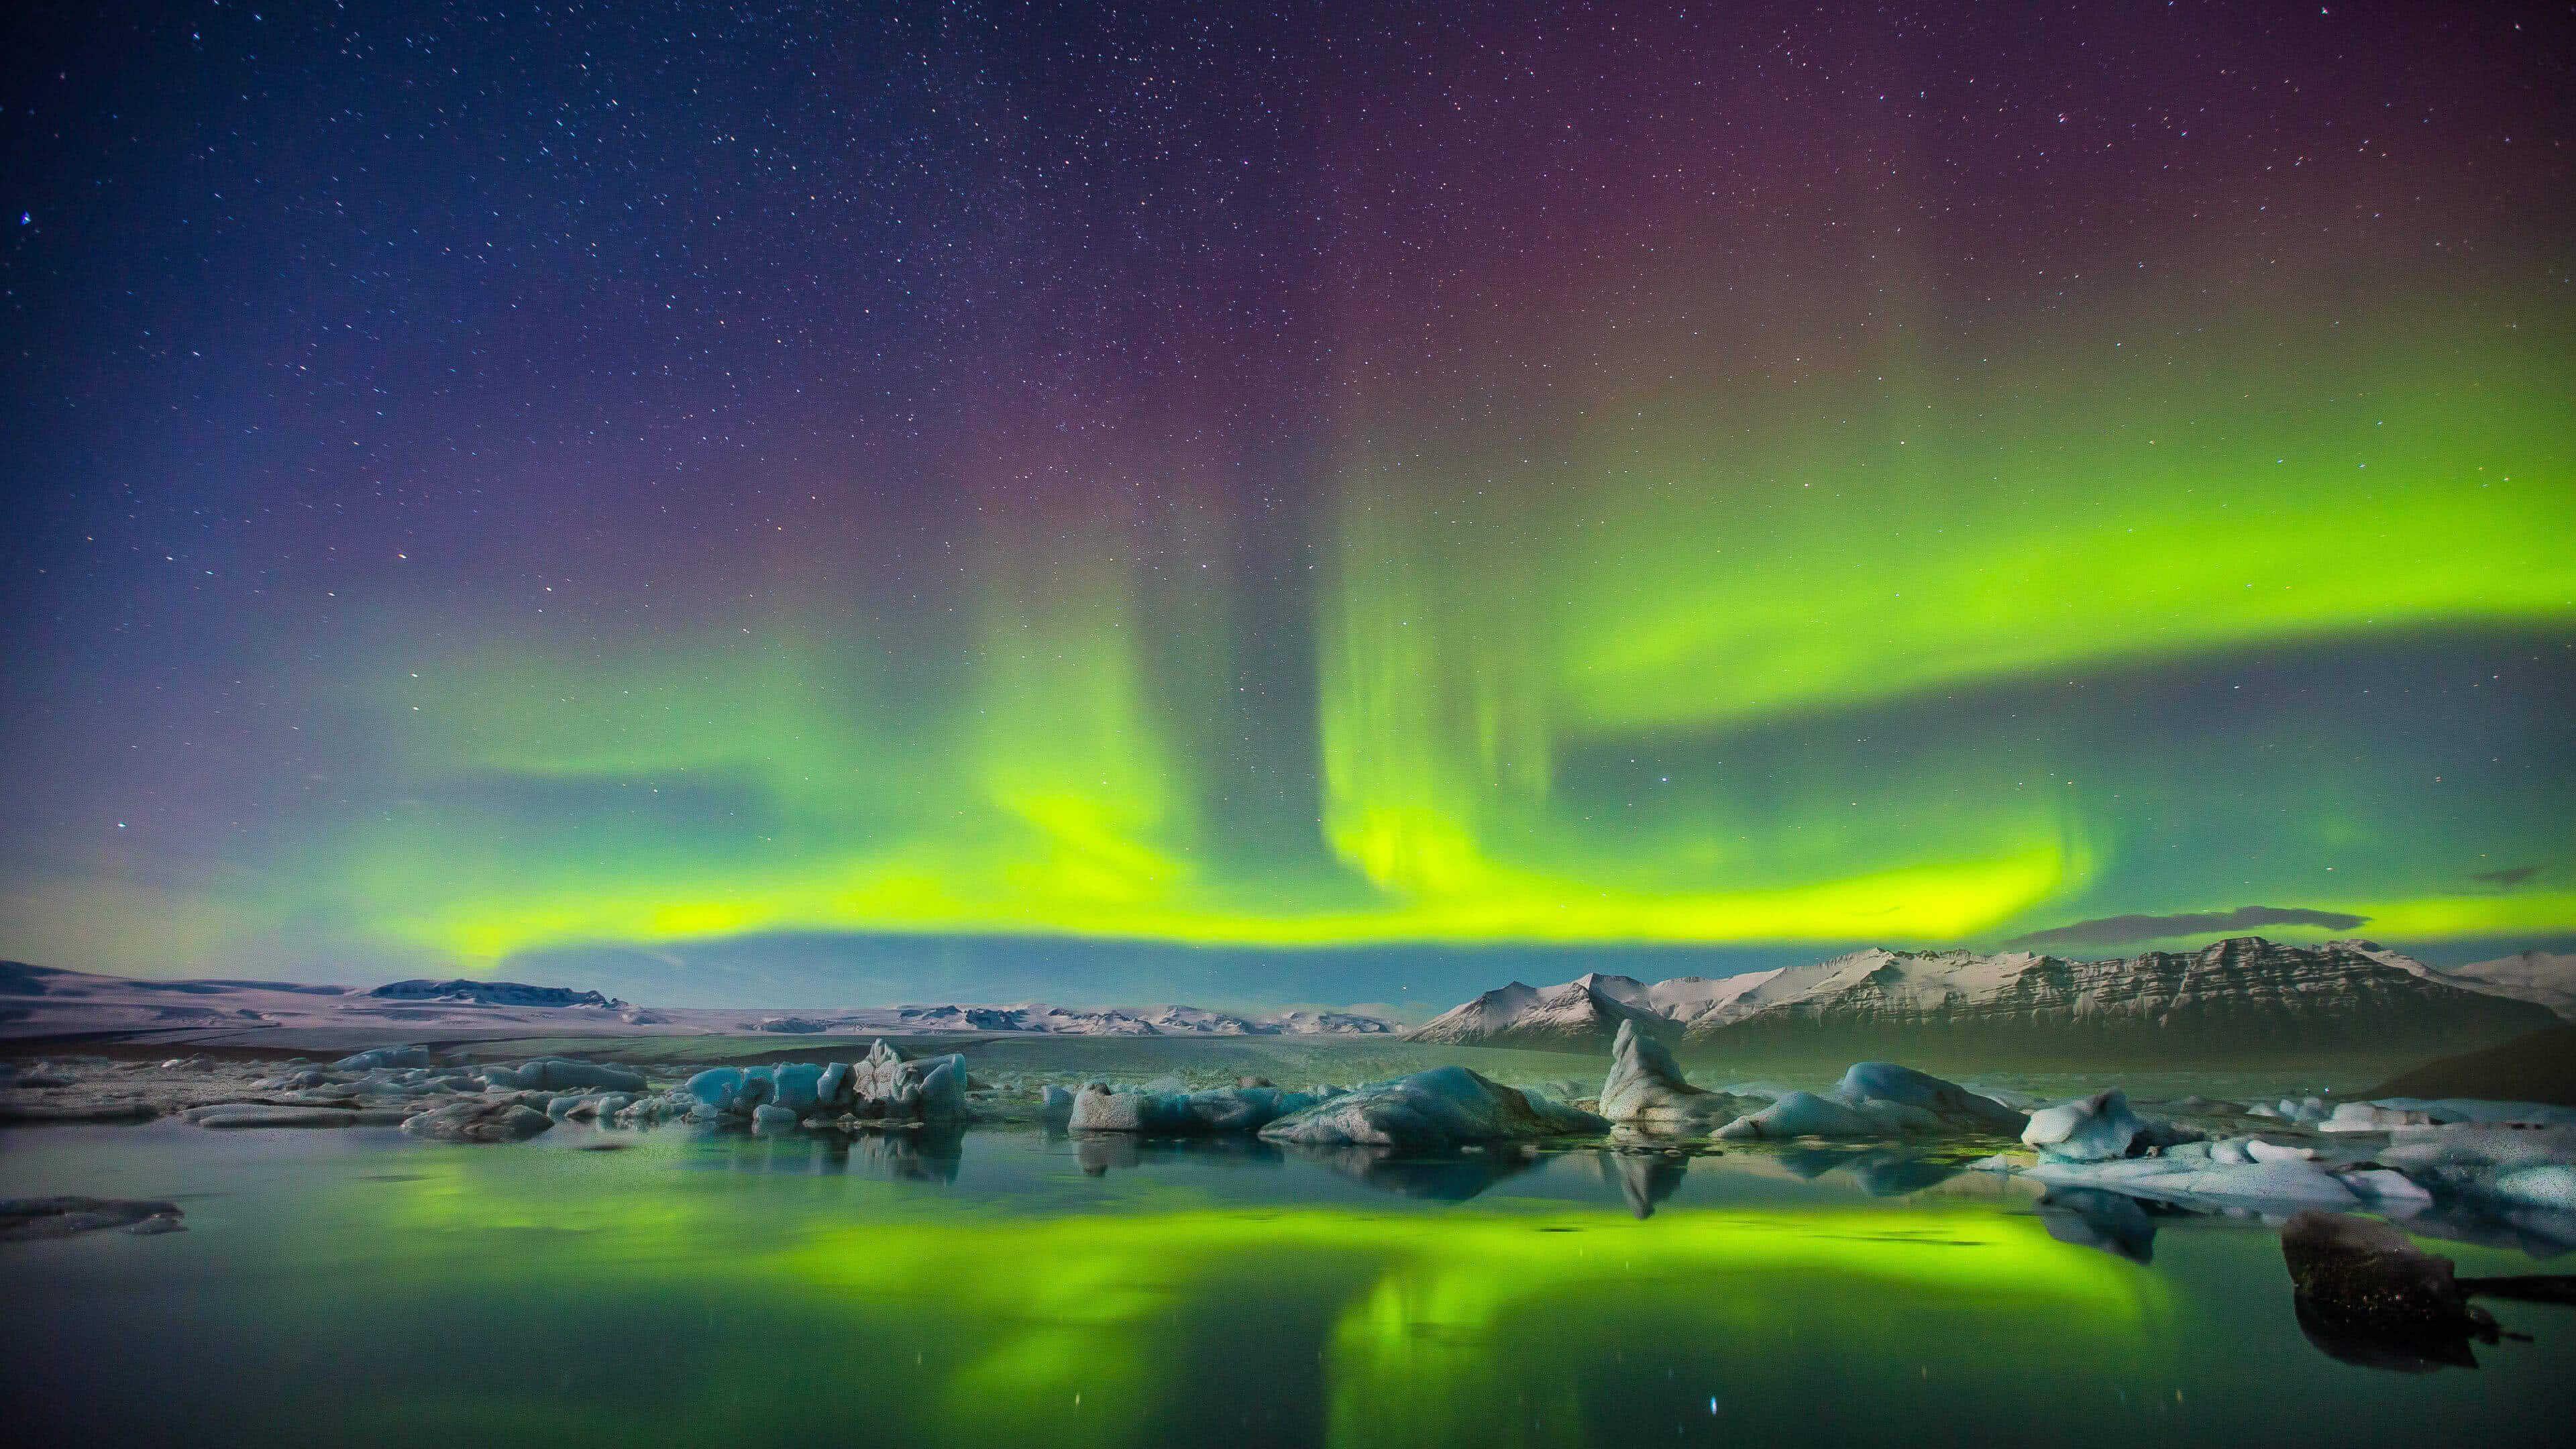 Aurora Borealis Northern Lights [3840 x 2160 Ultra HD]